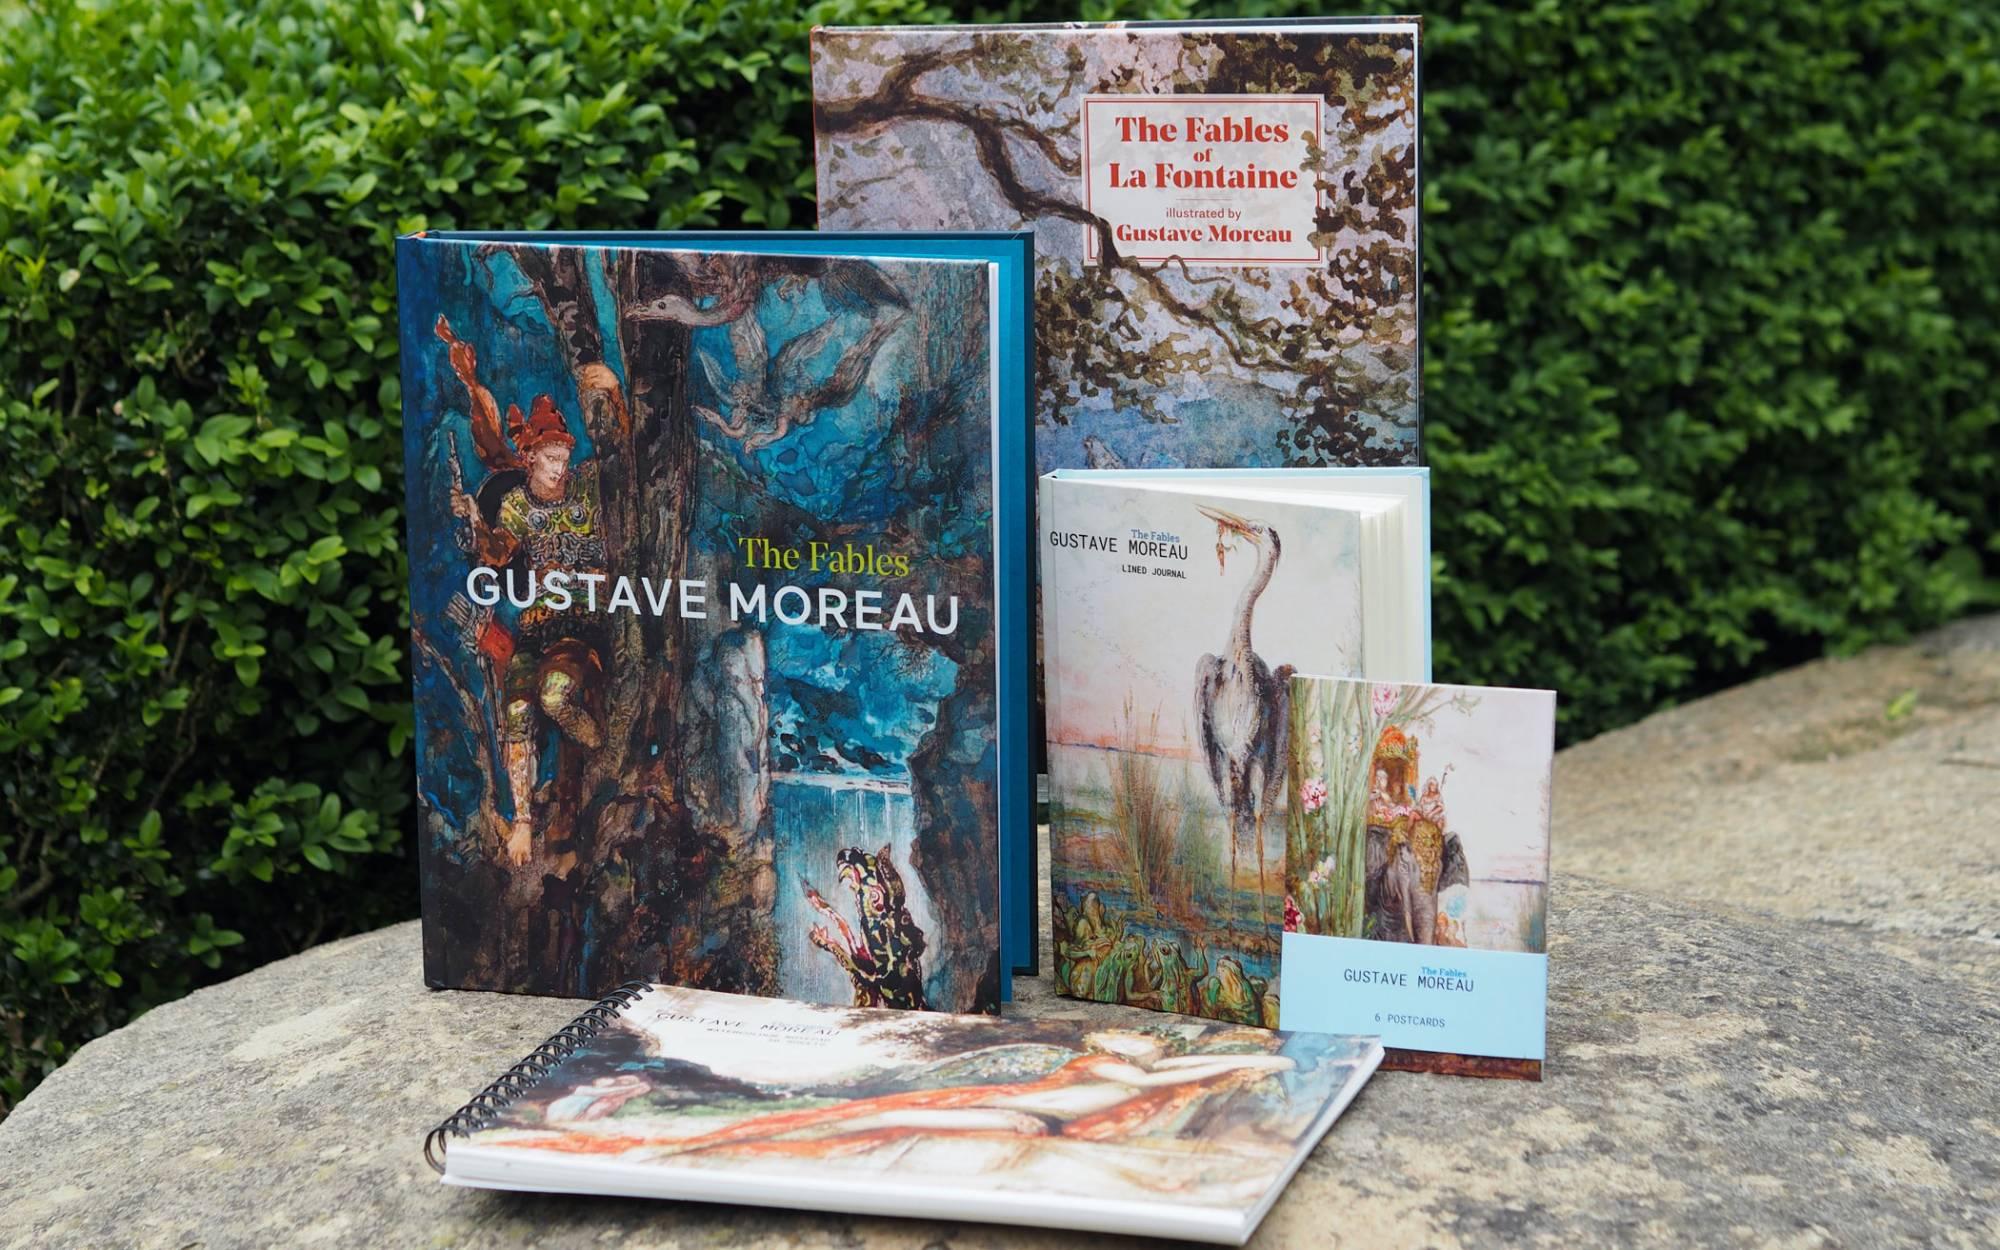 Gustave Moreau shop product range